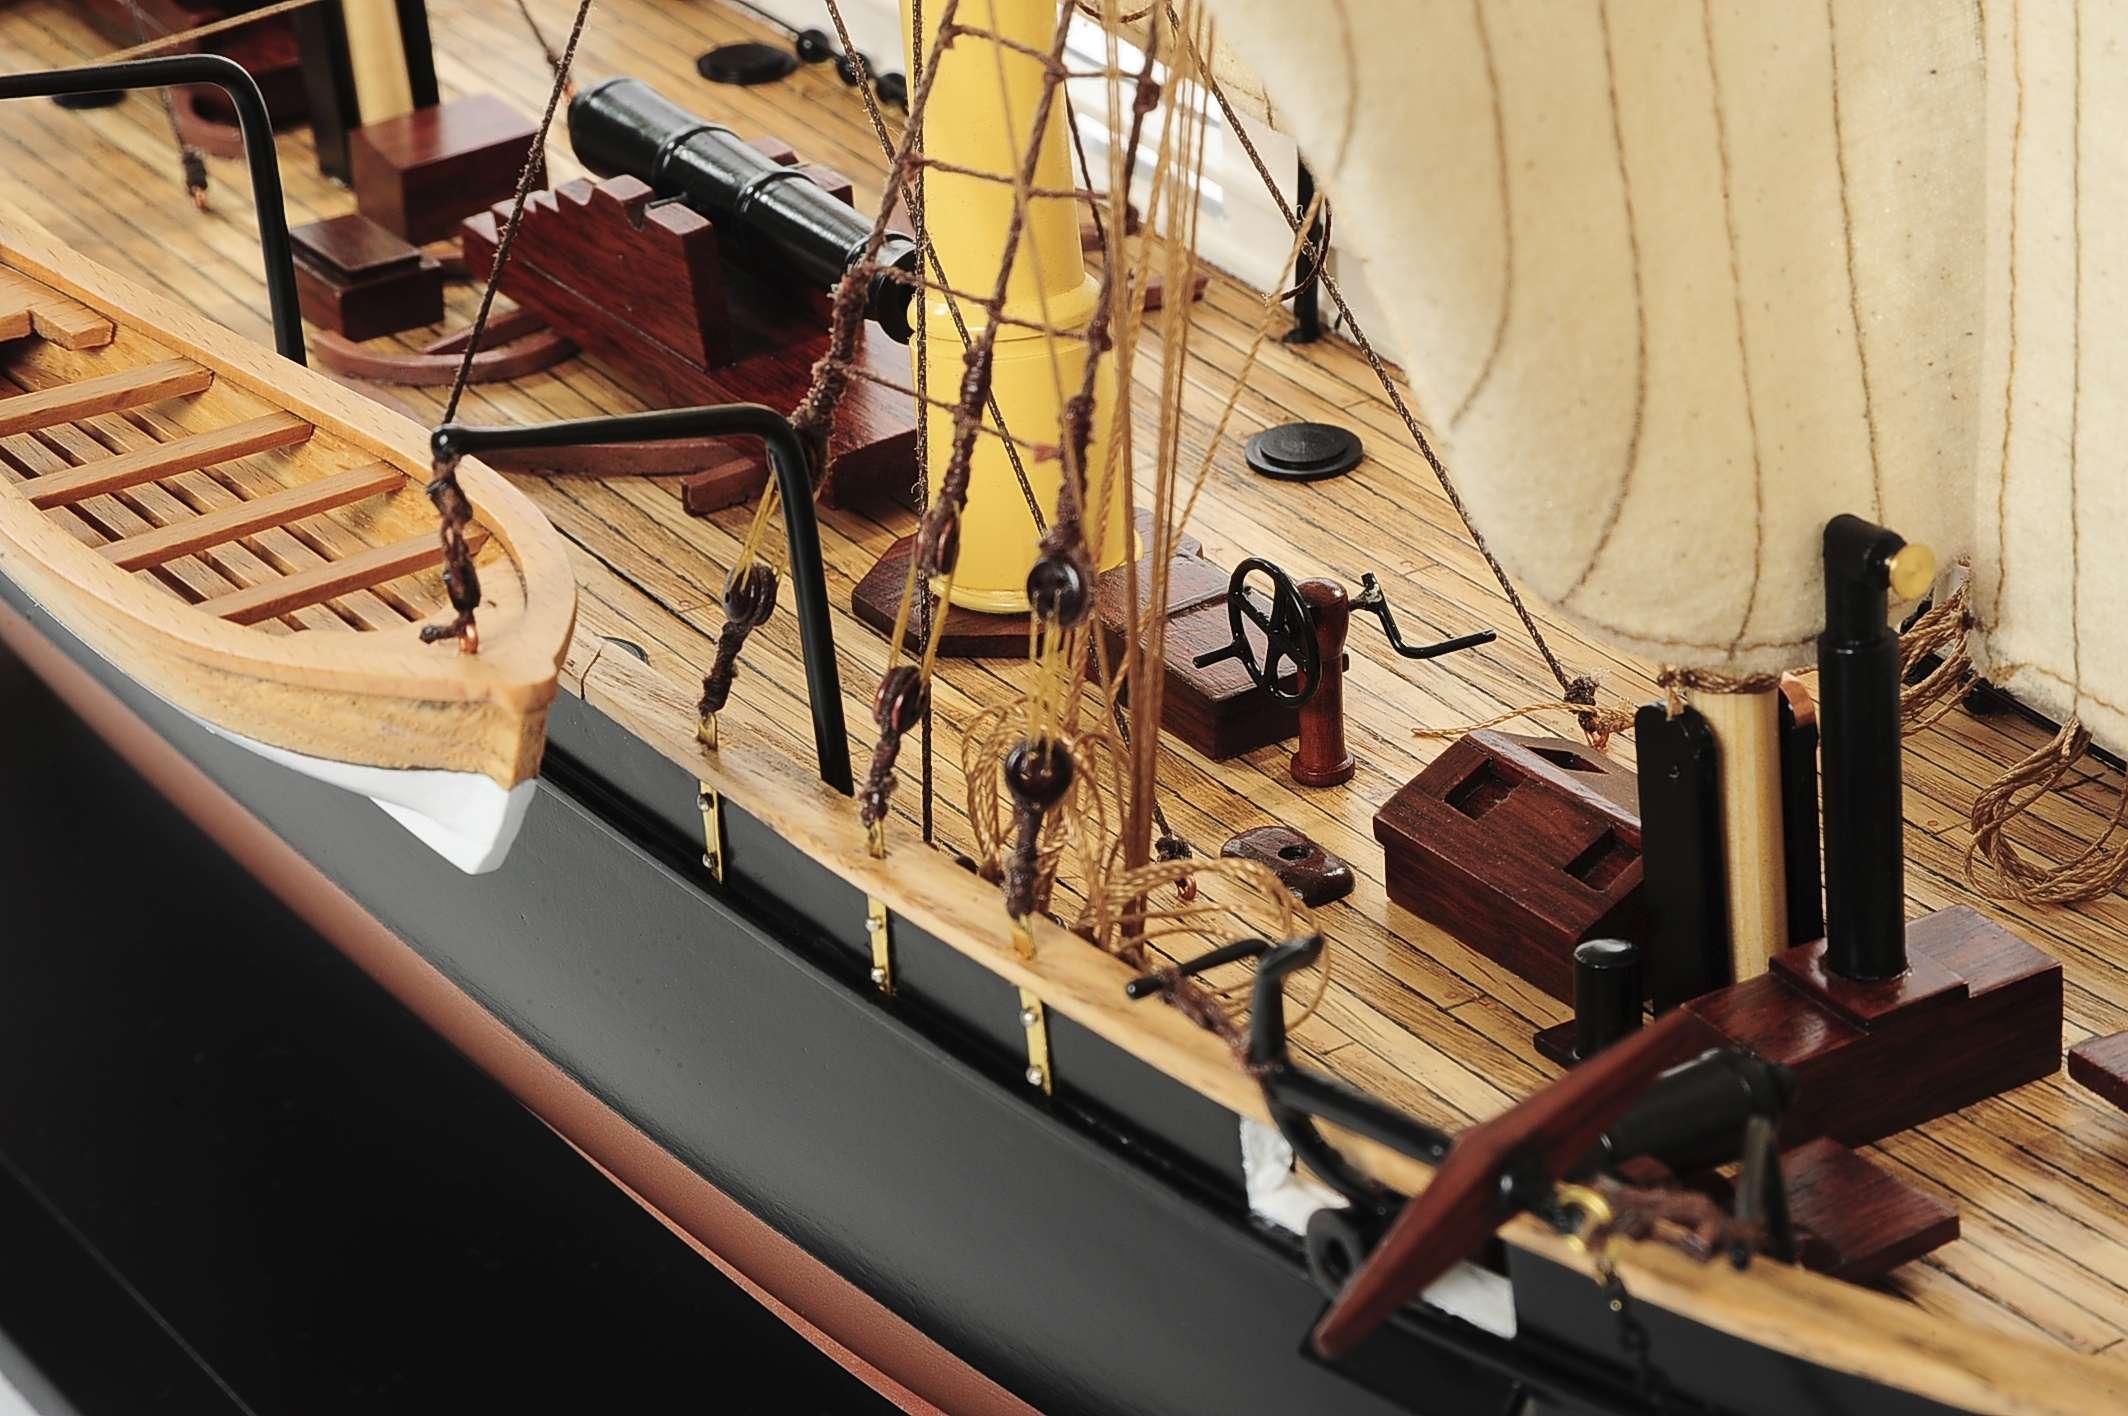 1428-4660-HMS-Cockchafer-2-Model-Boat